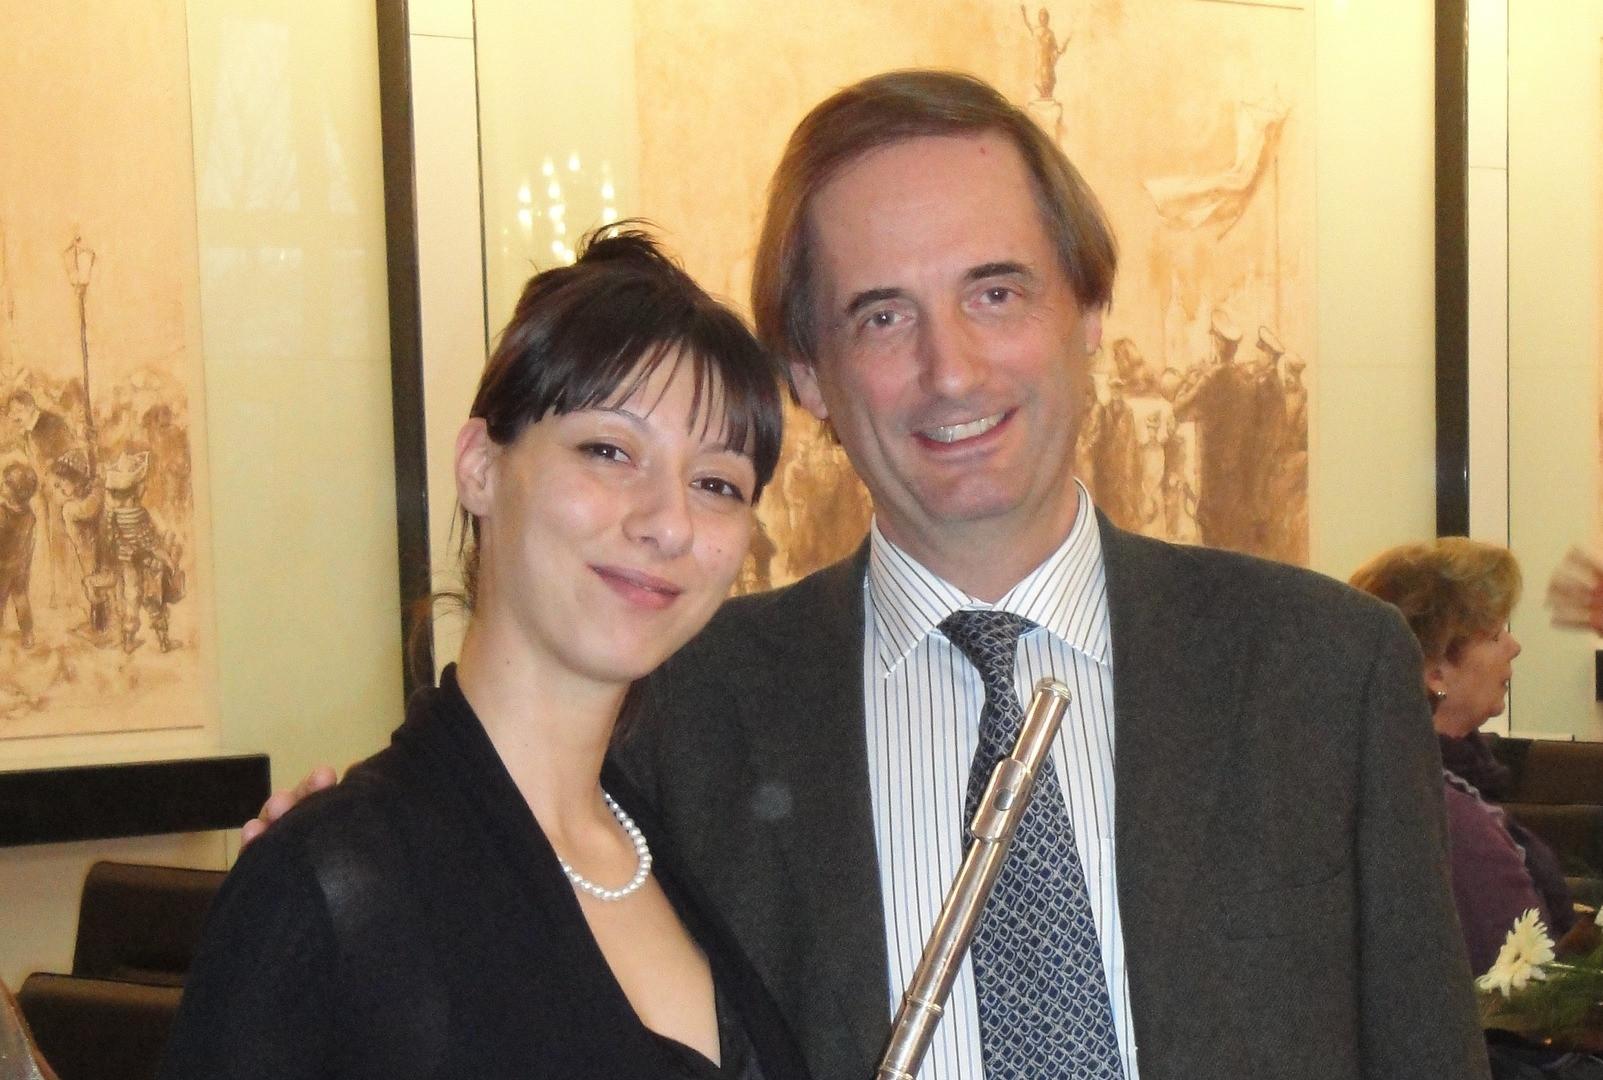 Dieter Flury - principal flutist of the Viena Pfilharmonic at the International Music Festival ''March Music Days'' Rousse, Bulgaria